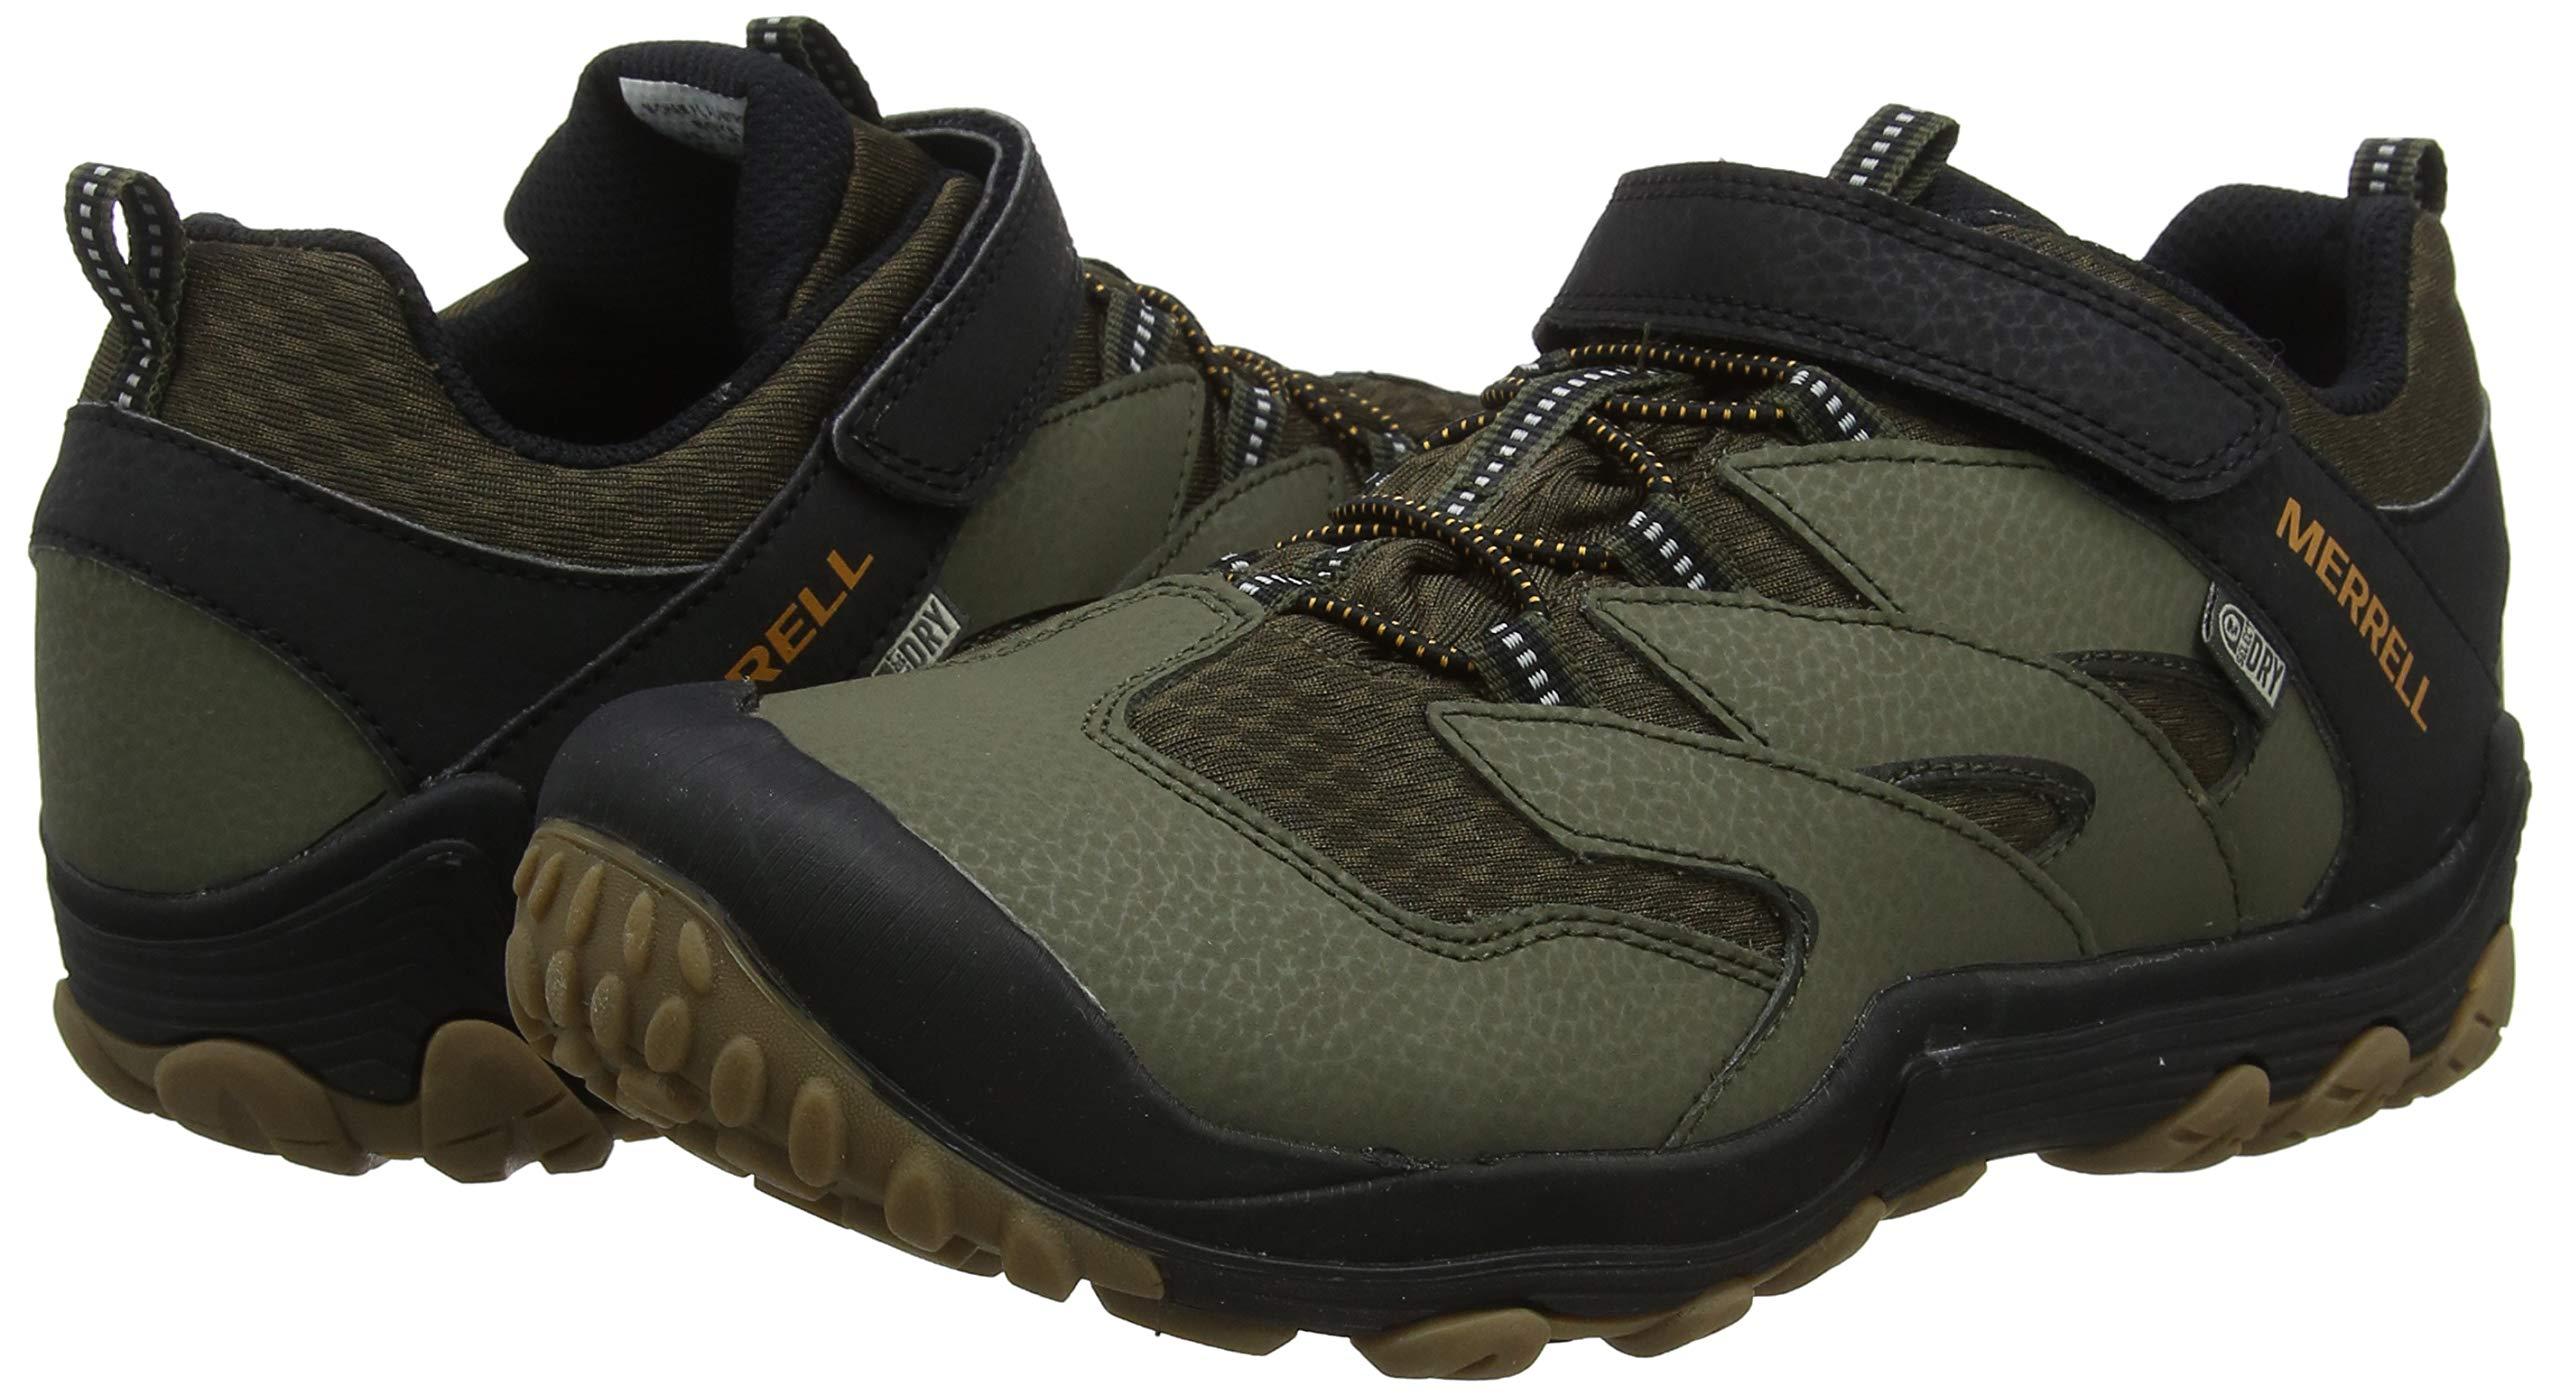 Merrell Unisex Kids M-Chameleon 7 Low a/C Waterproof Rise Hiking Boots 5